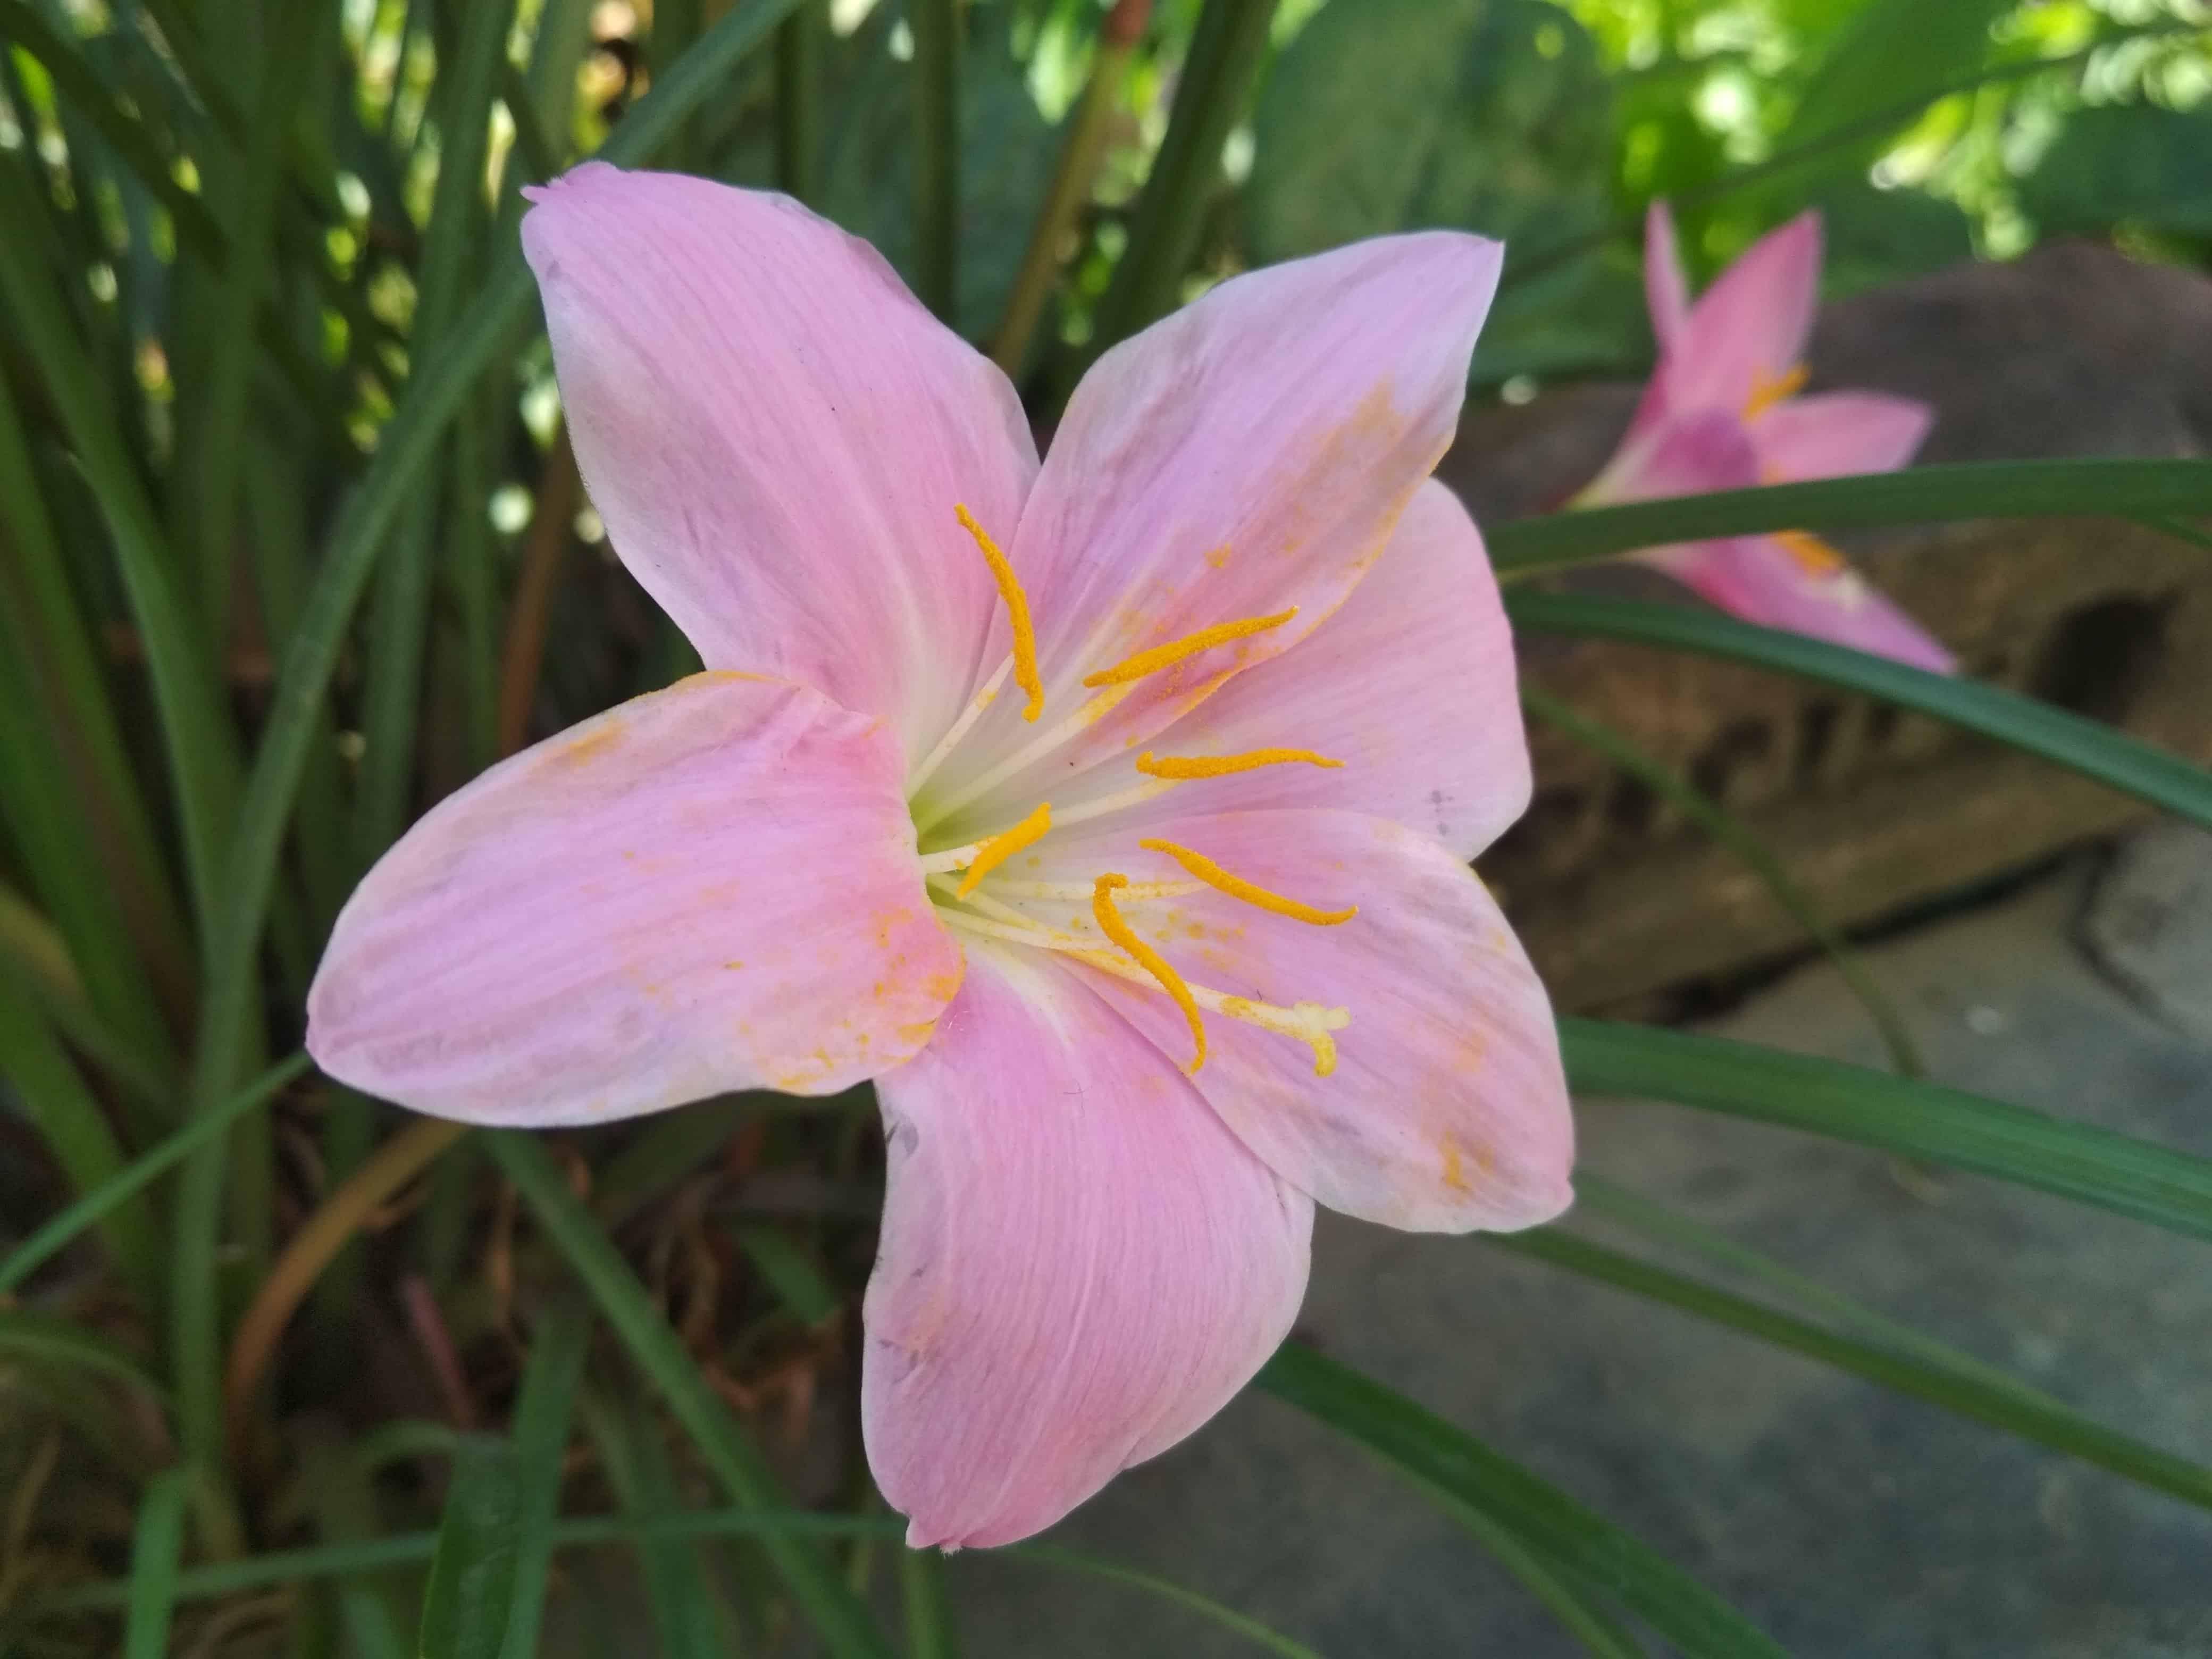 Free picture: lily, pistil, nature, garden, green leaf ...